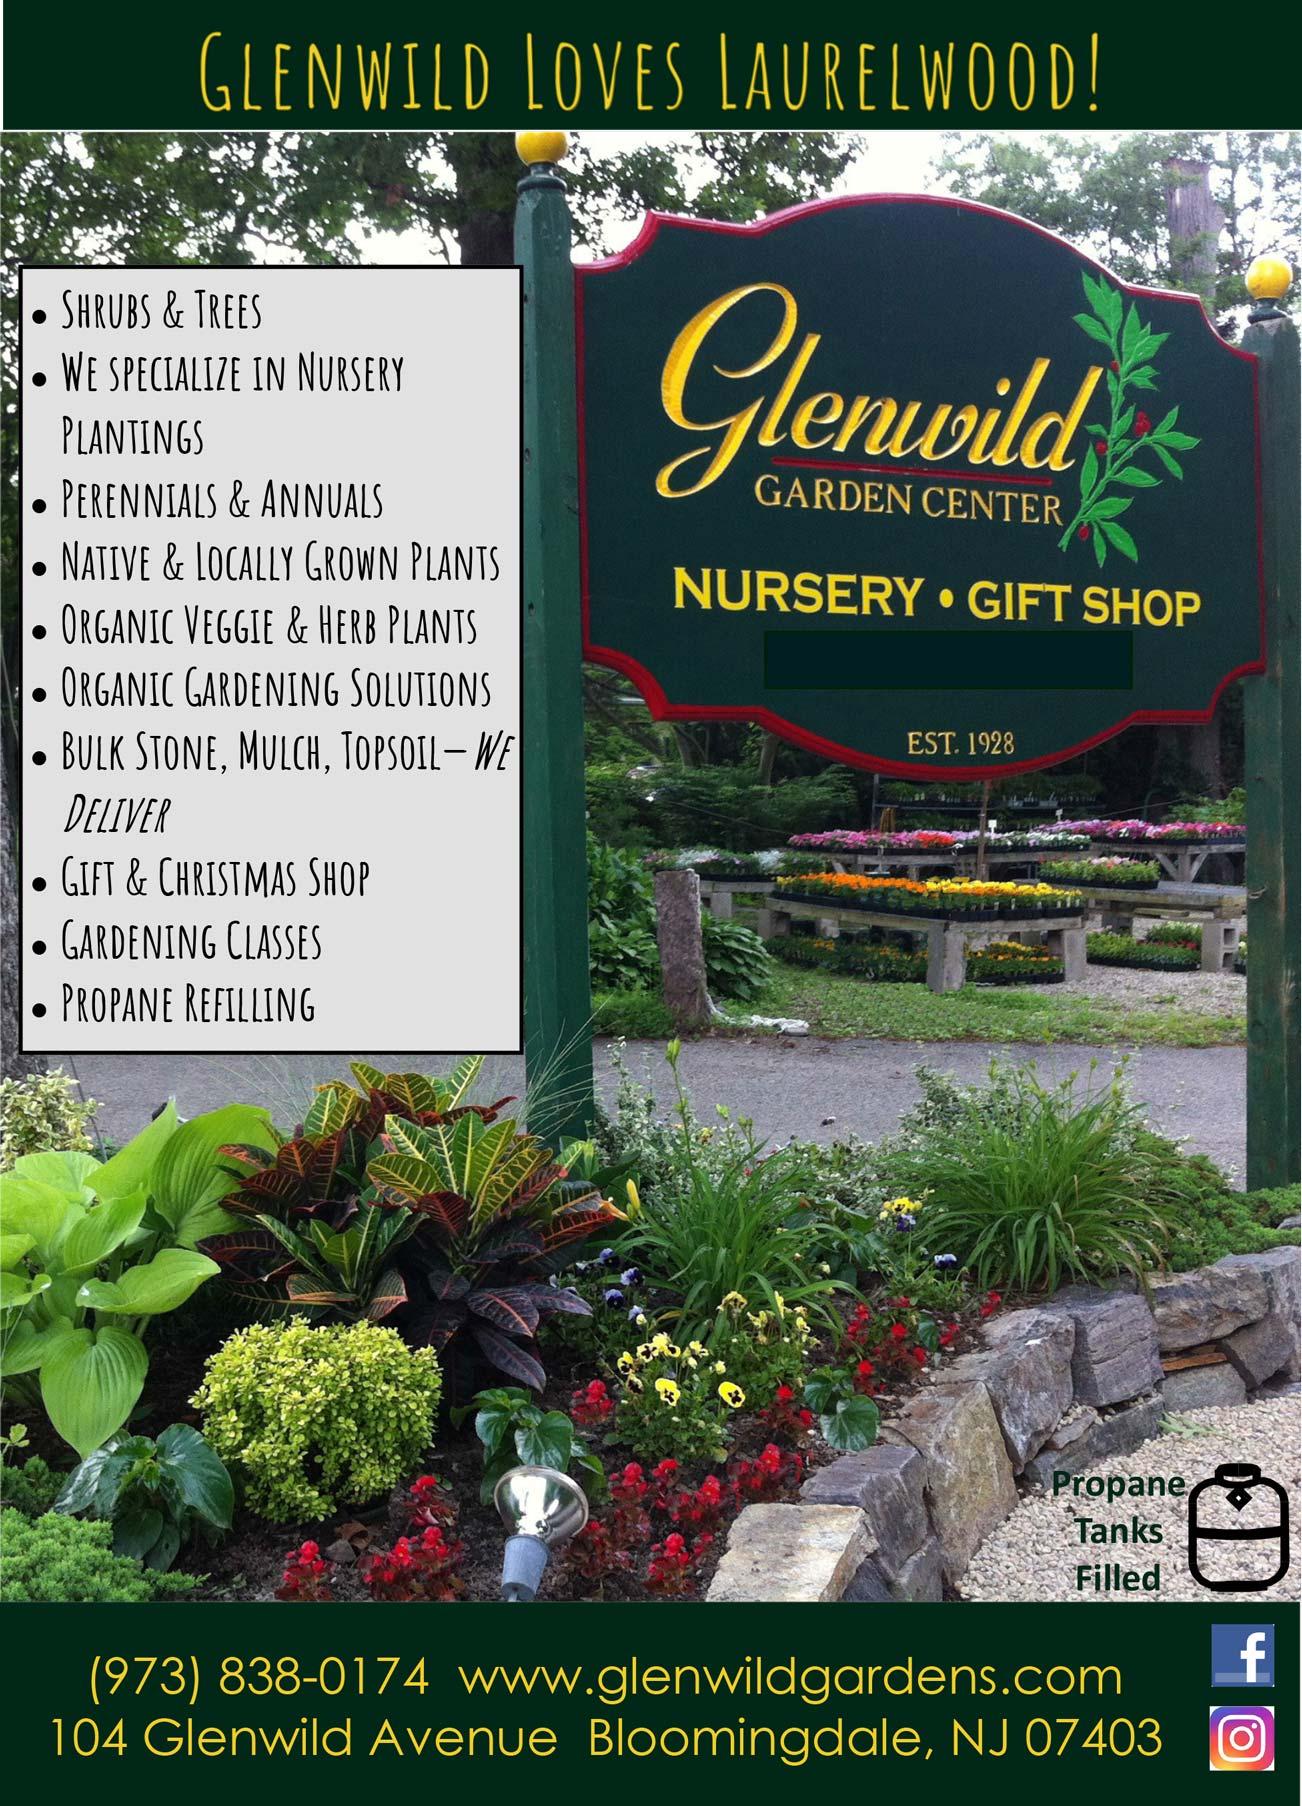 Glenwild